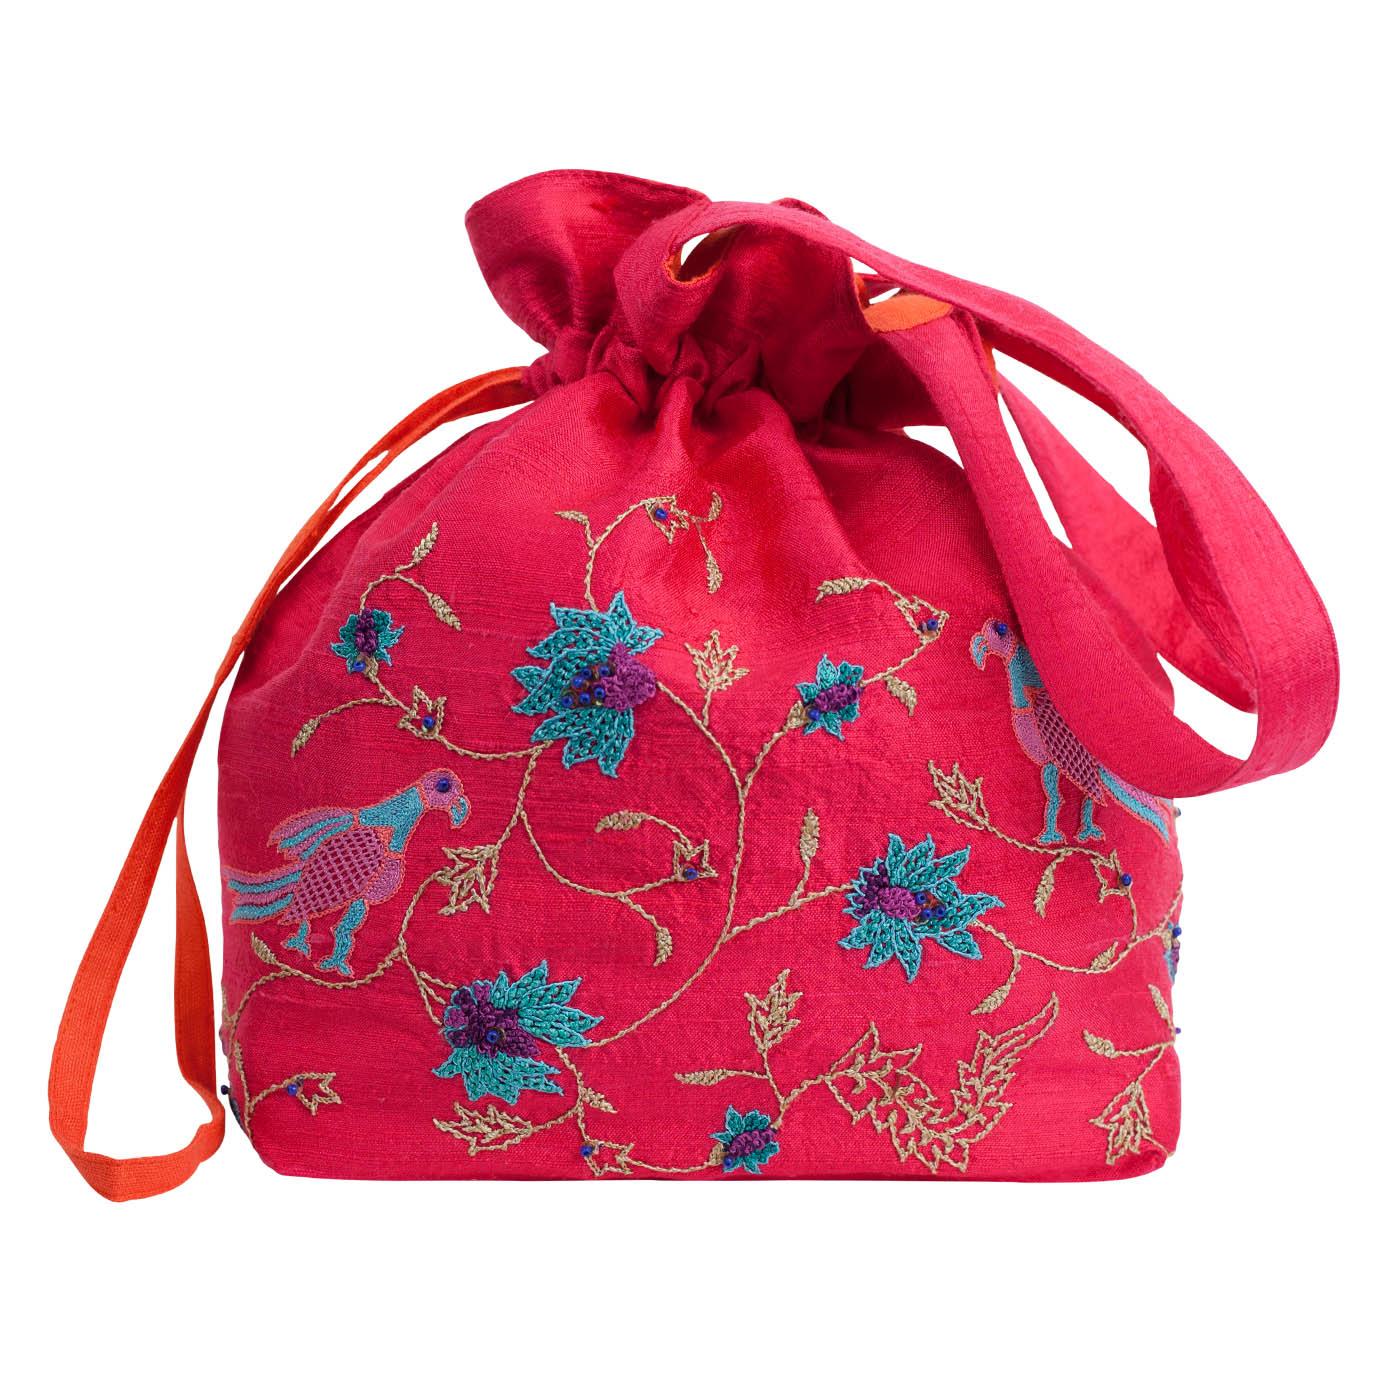 MINC Couture Embroidered Silk Potli Bag in Fuchsia